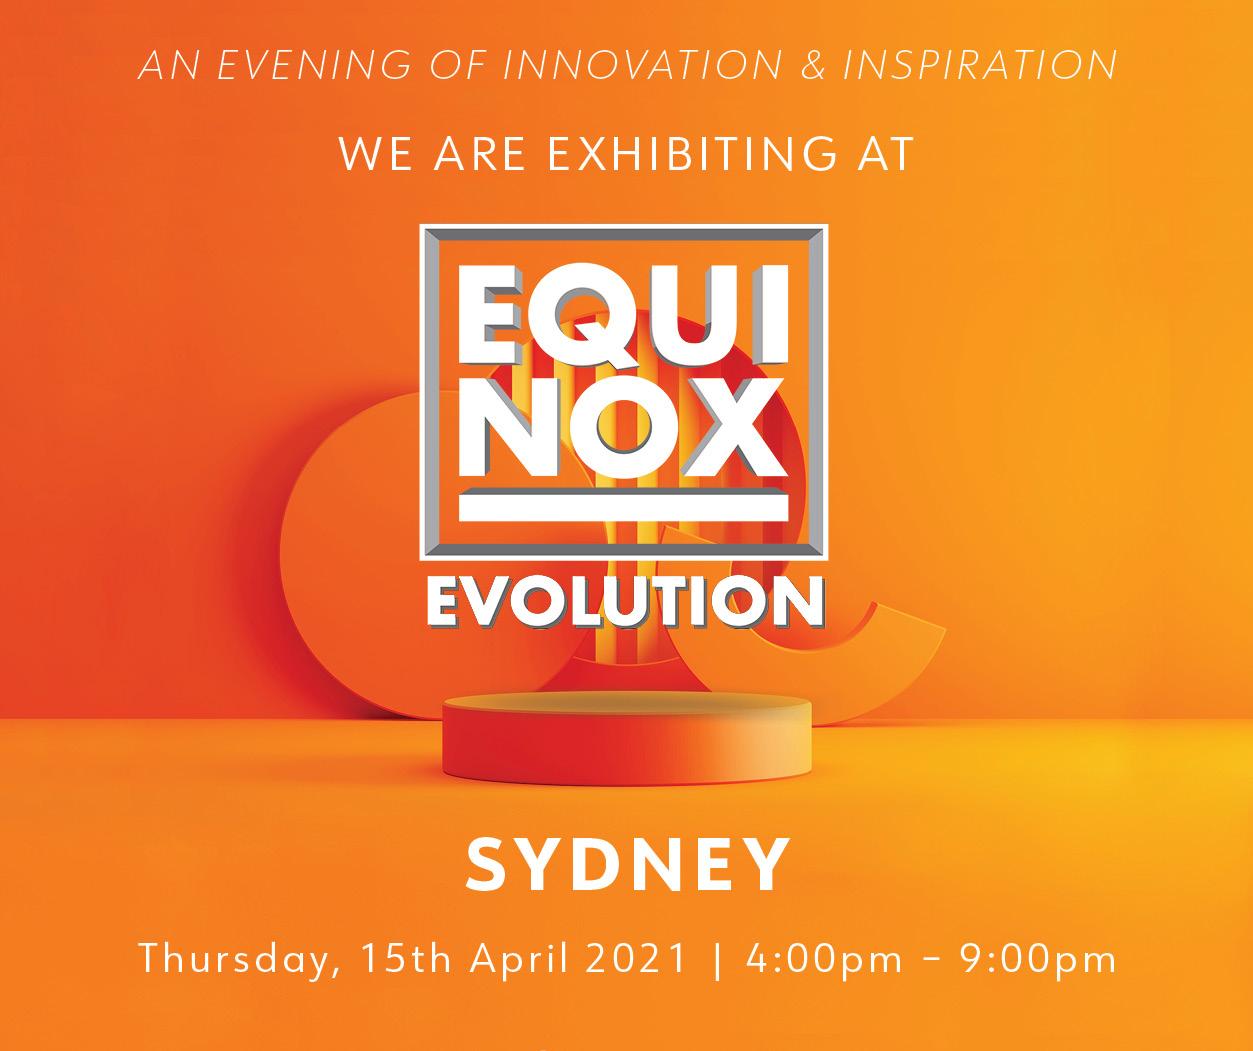 Aluminium Facade Systems to Exhibit at Equinox Evolution Sydney by Archify